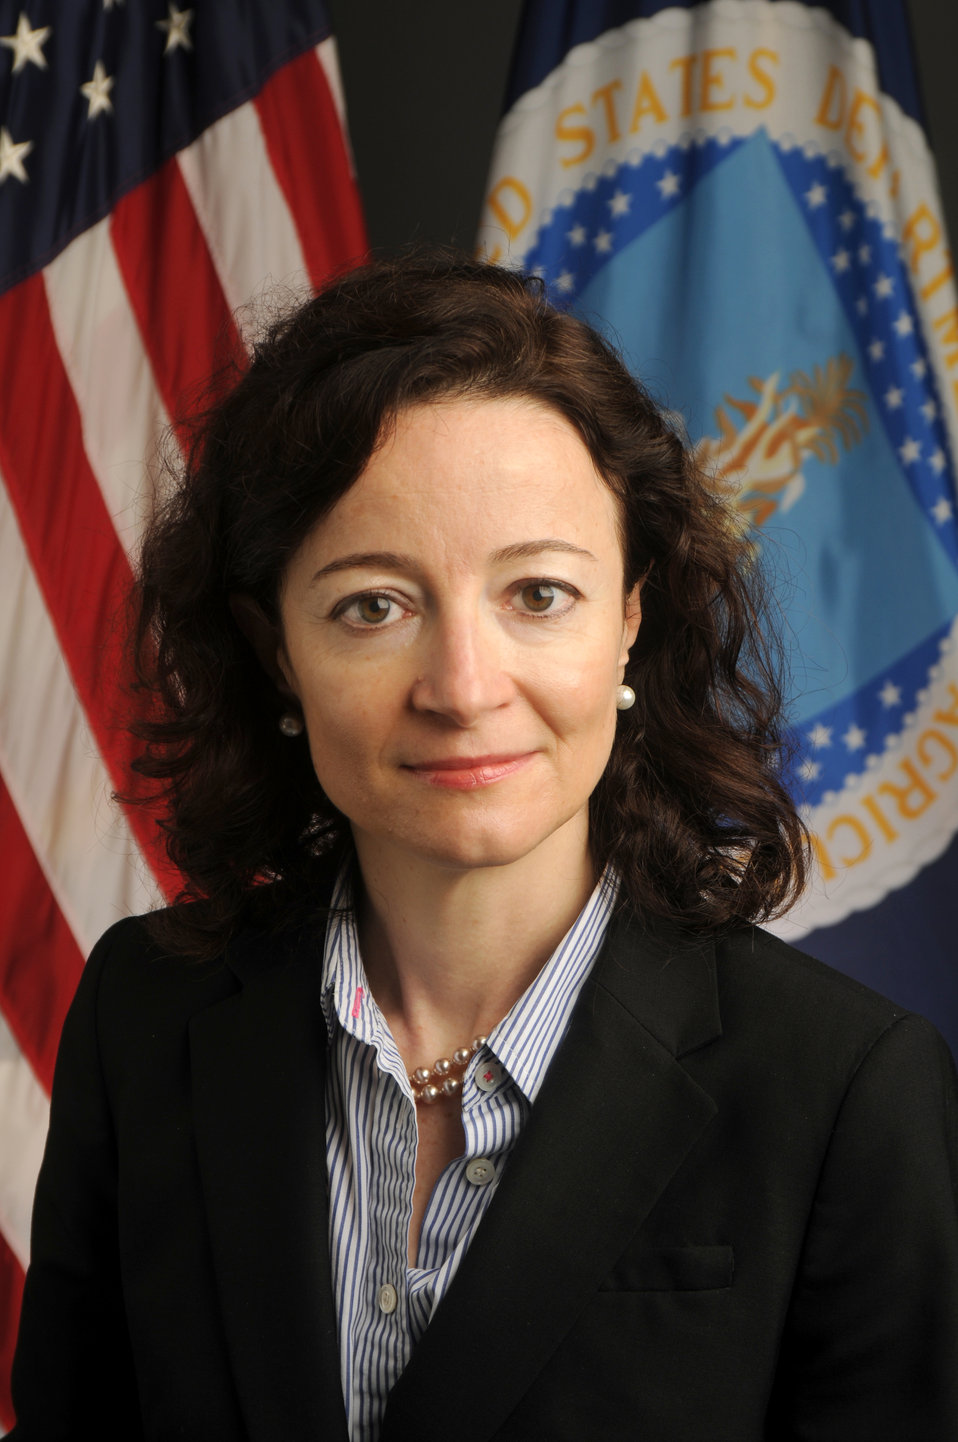 10di1067-011 Deputy Administrator Rural Utility Service Jessica Zufolo